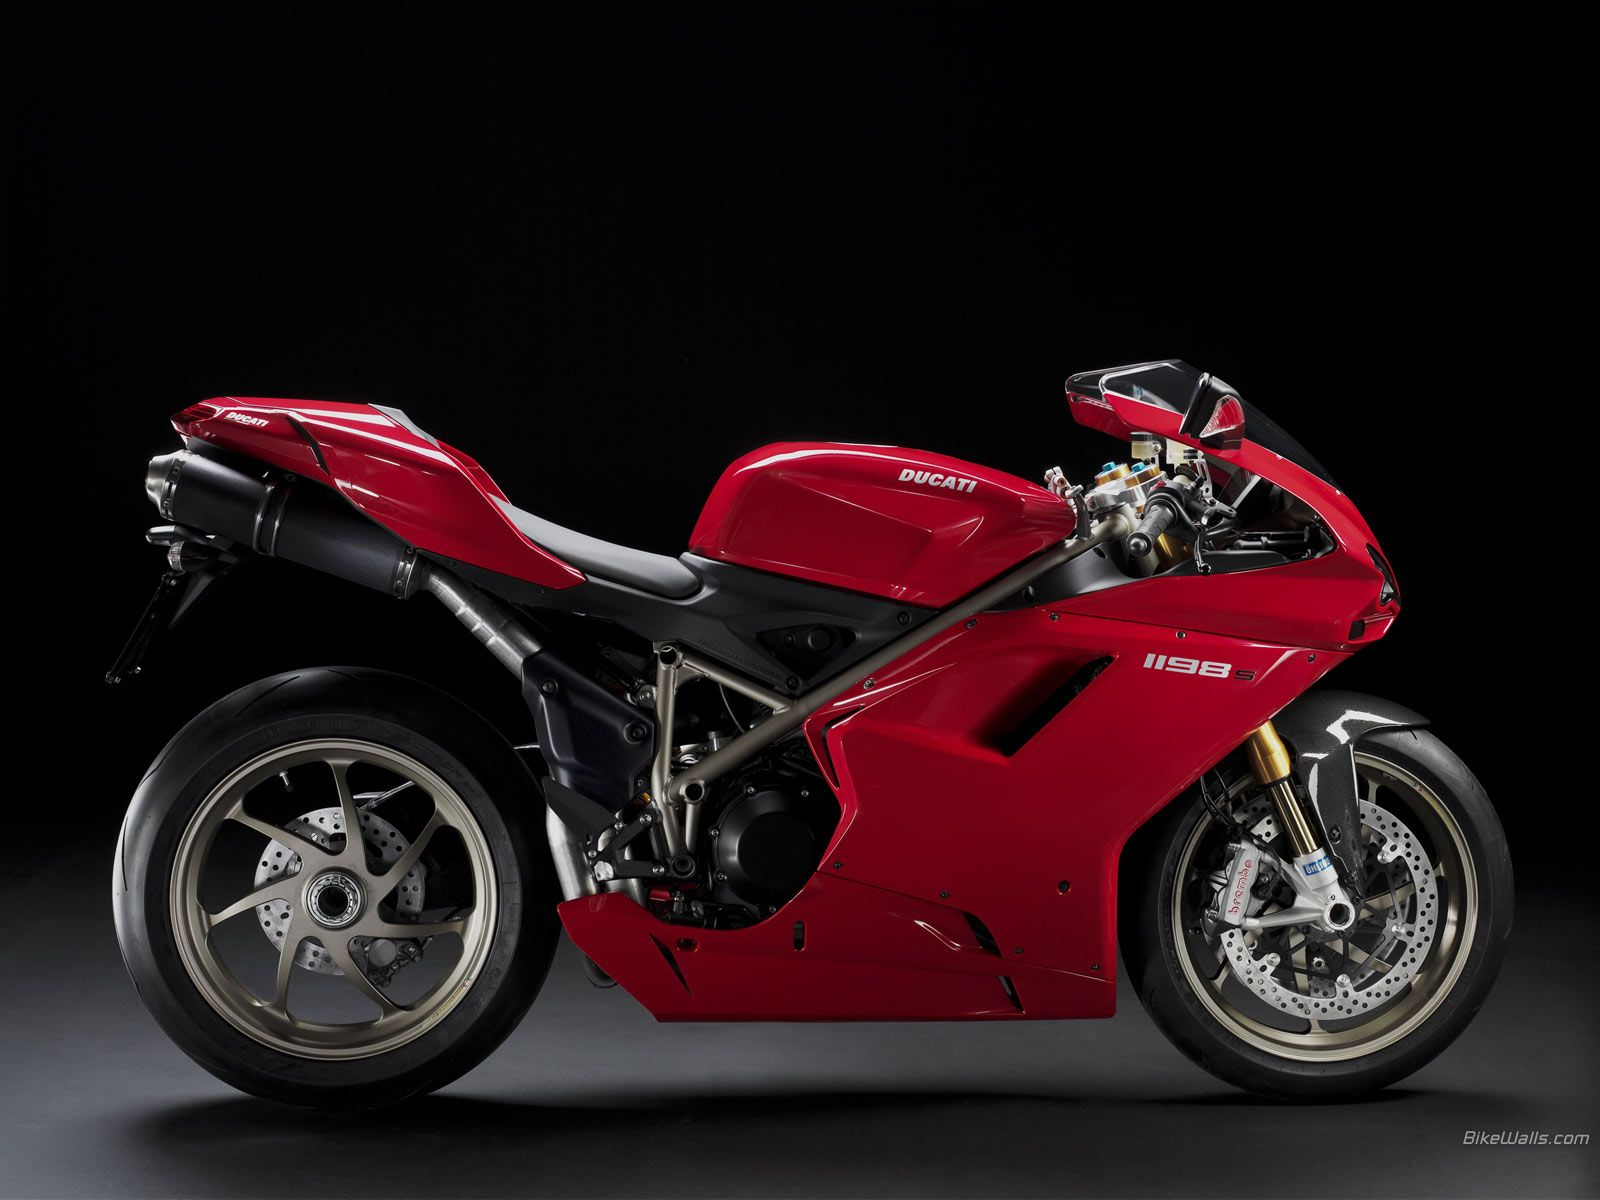 Ducati 1198s 2009 | Ducati Panigale Superbike Motorcycles ...